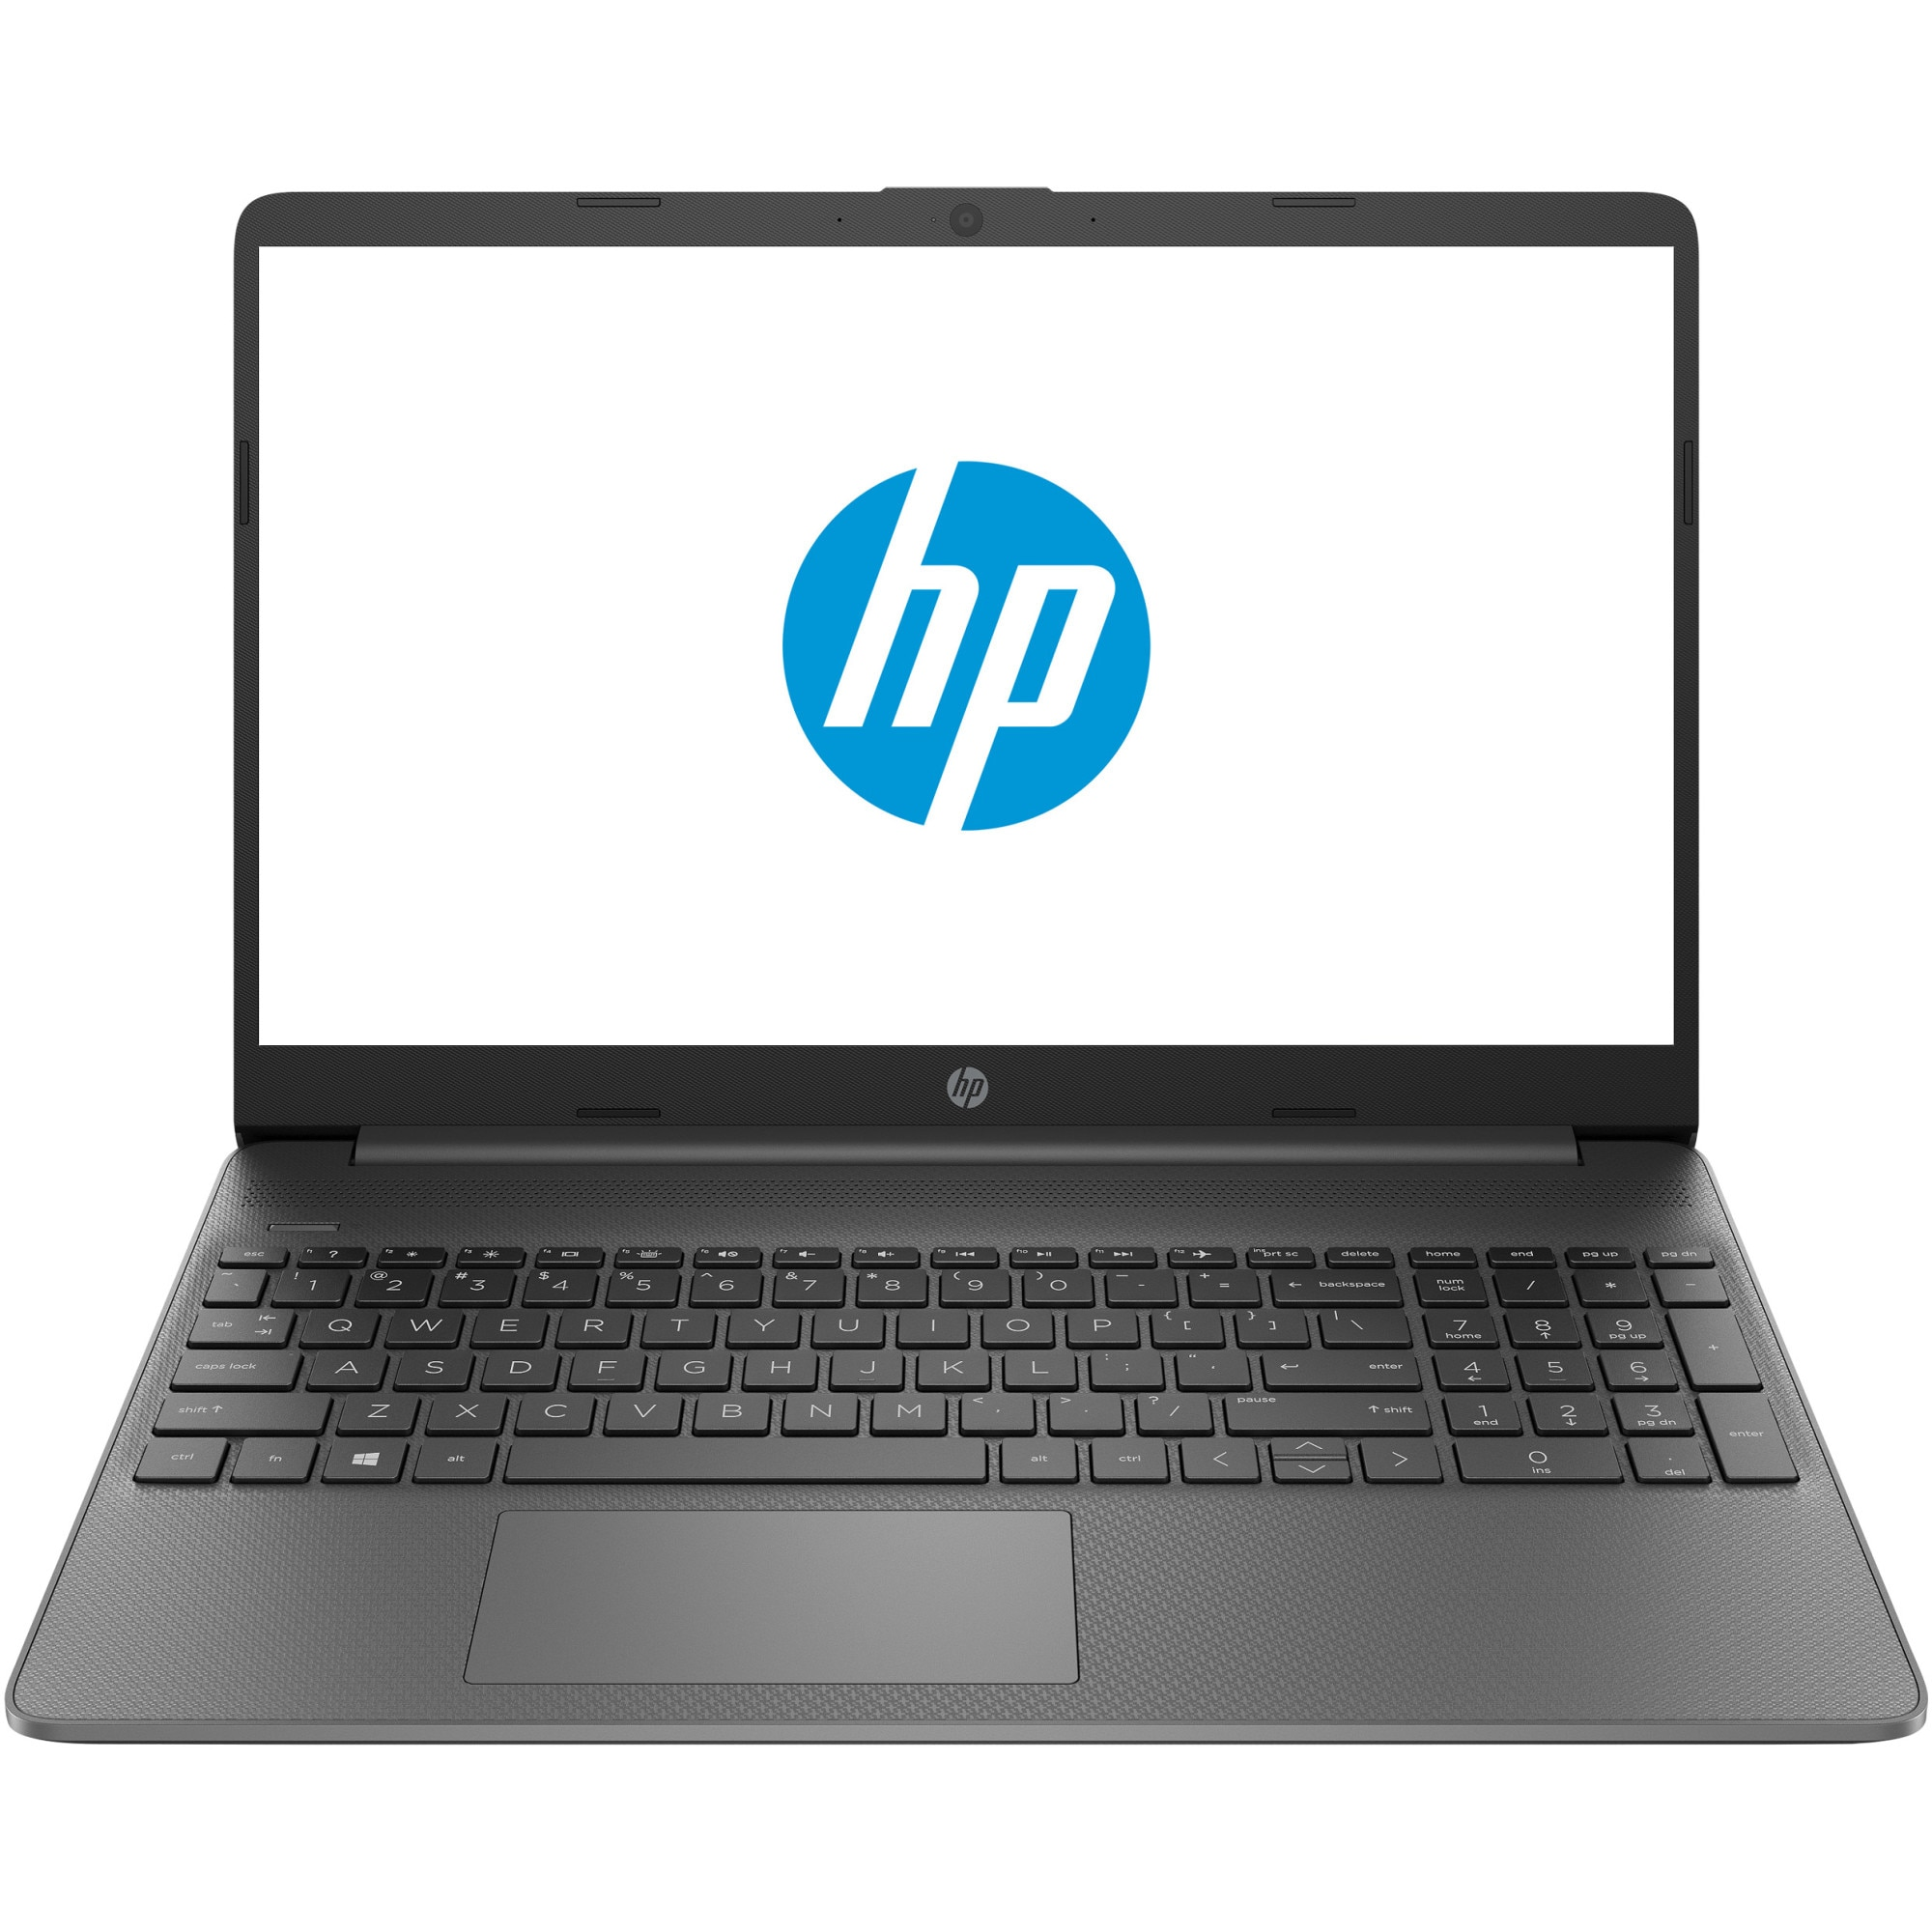 "Fotografie Laptop HP 15 15s-eq0028nq cu procesor AMD Ryzen™ 3 3200U pana la 3.50 GHz, 15.6"", Full HD, 8GB, 256GB SSD, AMD Radeon™ Vega 3 Graphics, Free DOS, Gray"